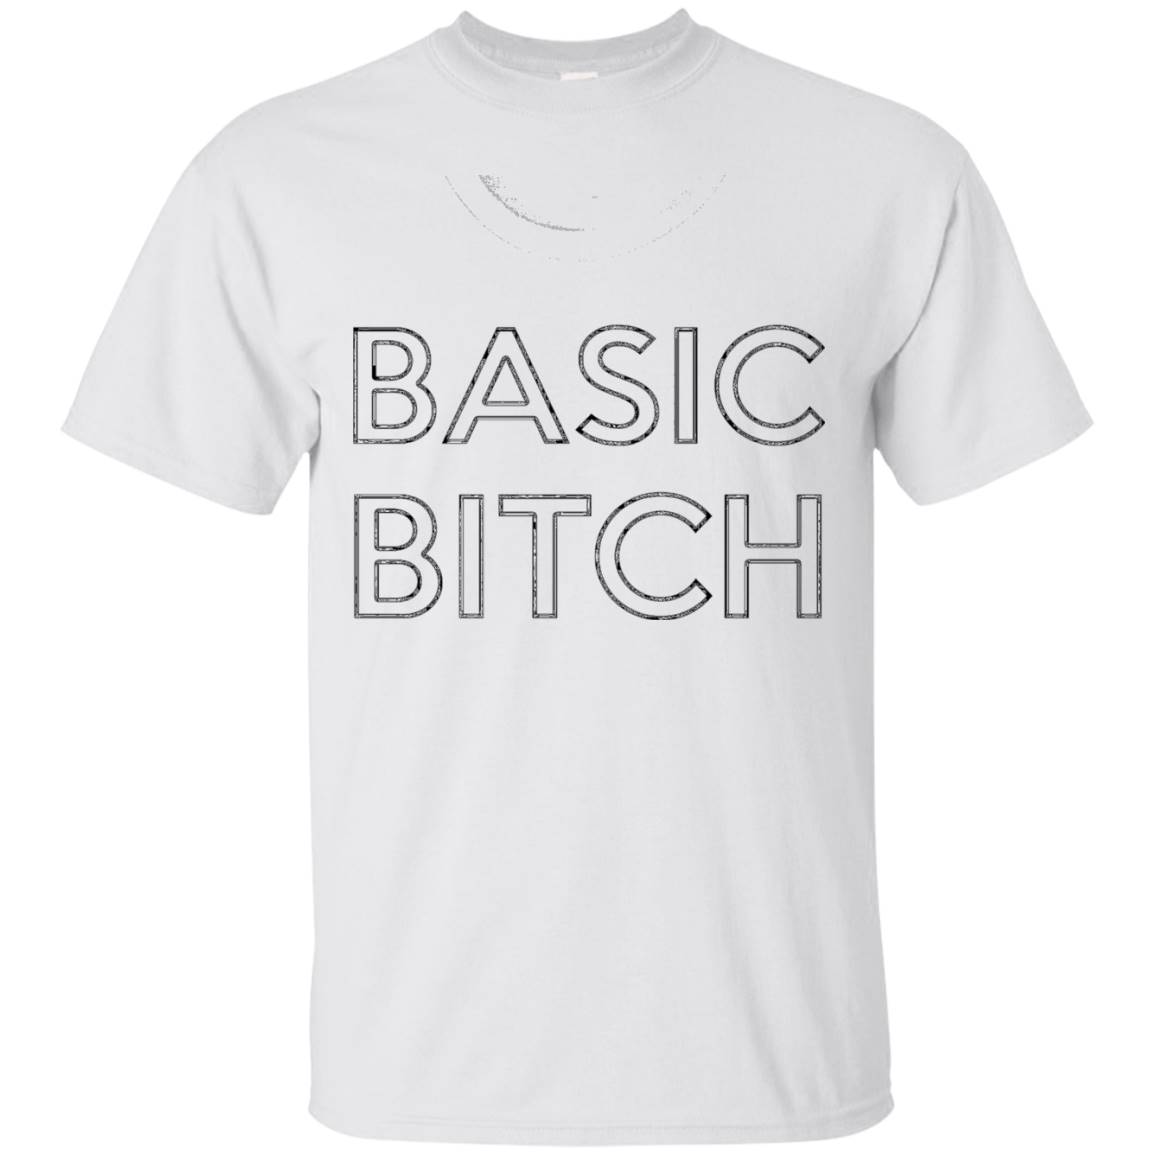 Basic Bitch Funny Short Sleeve Tee Shirt